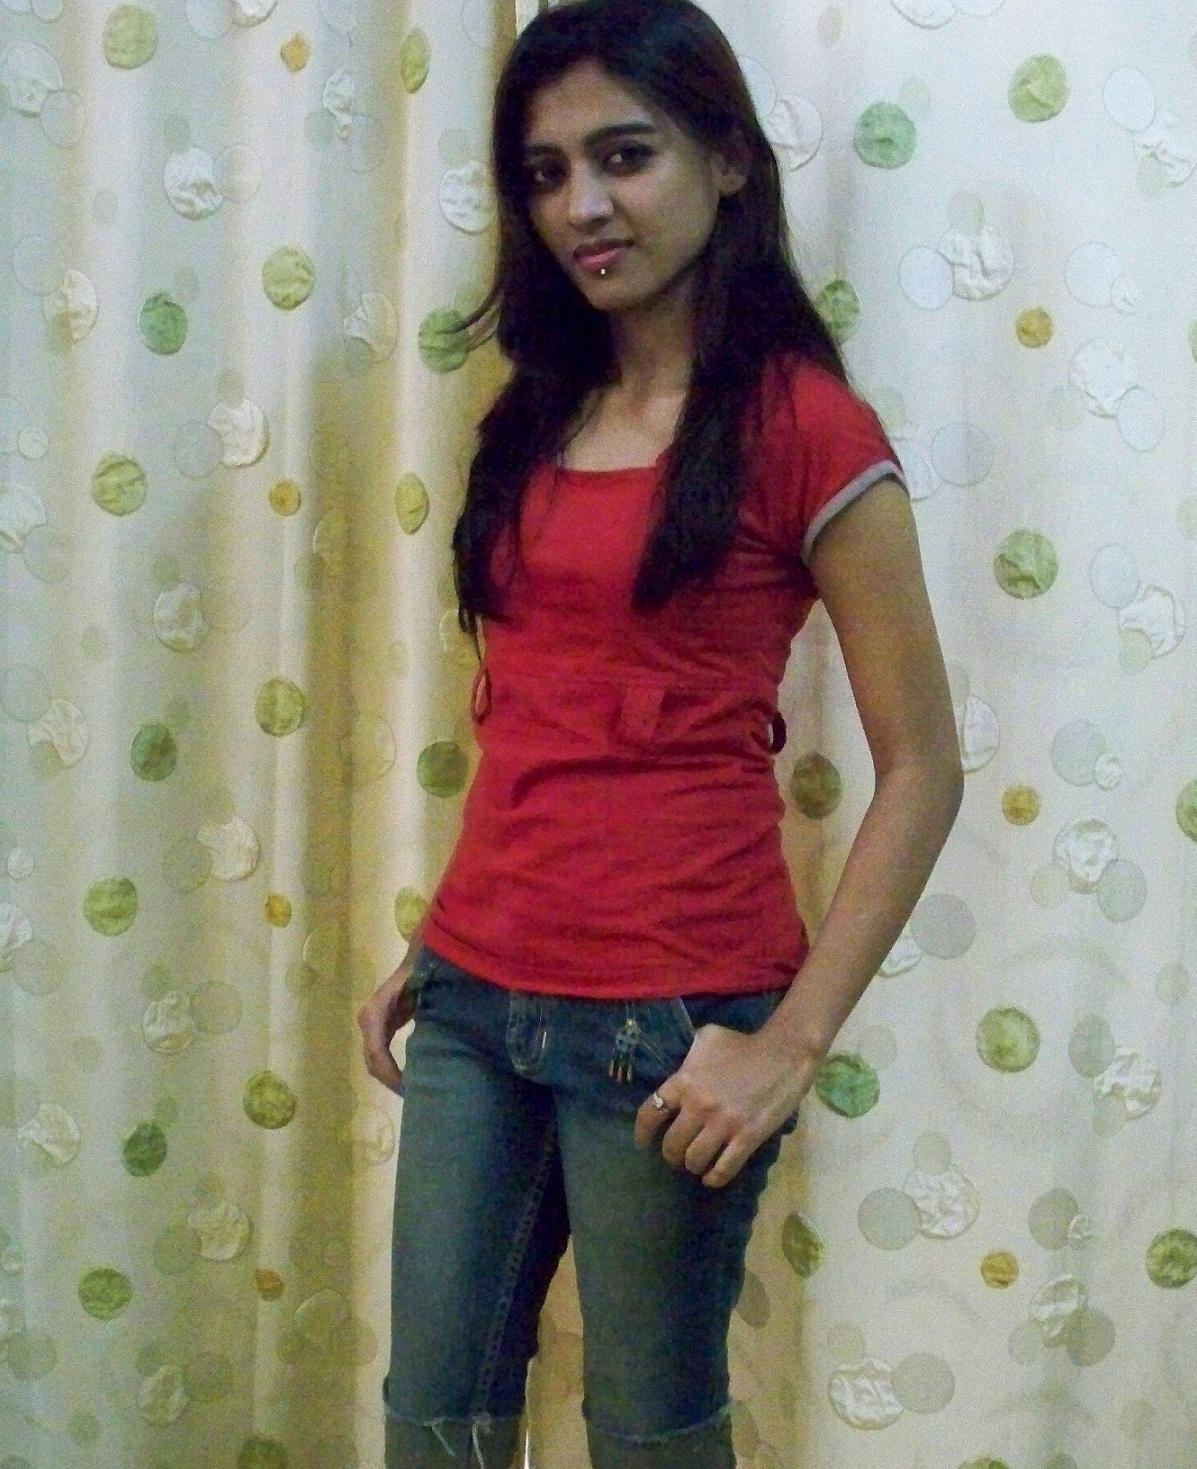 Prachi Agarwal Roadies 8,Prachi Agarwal Roadies